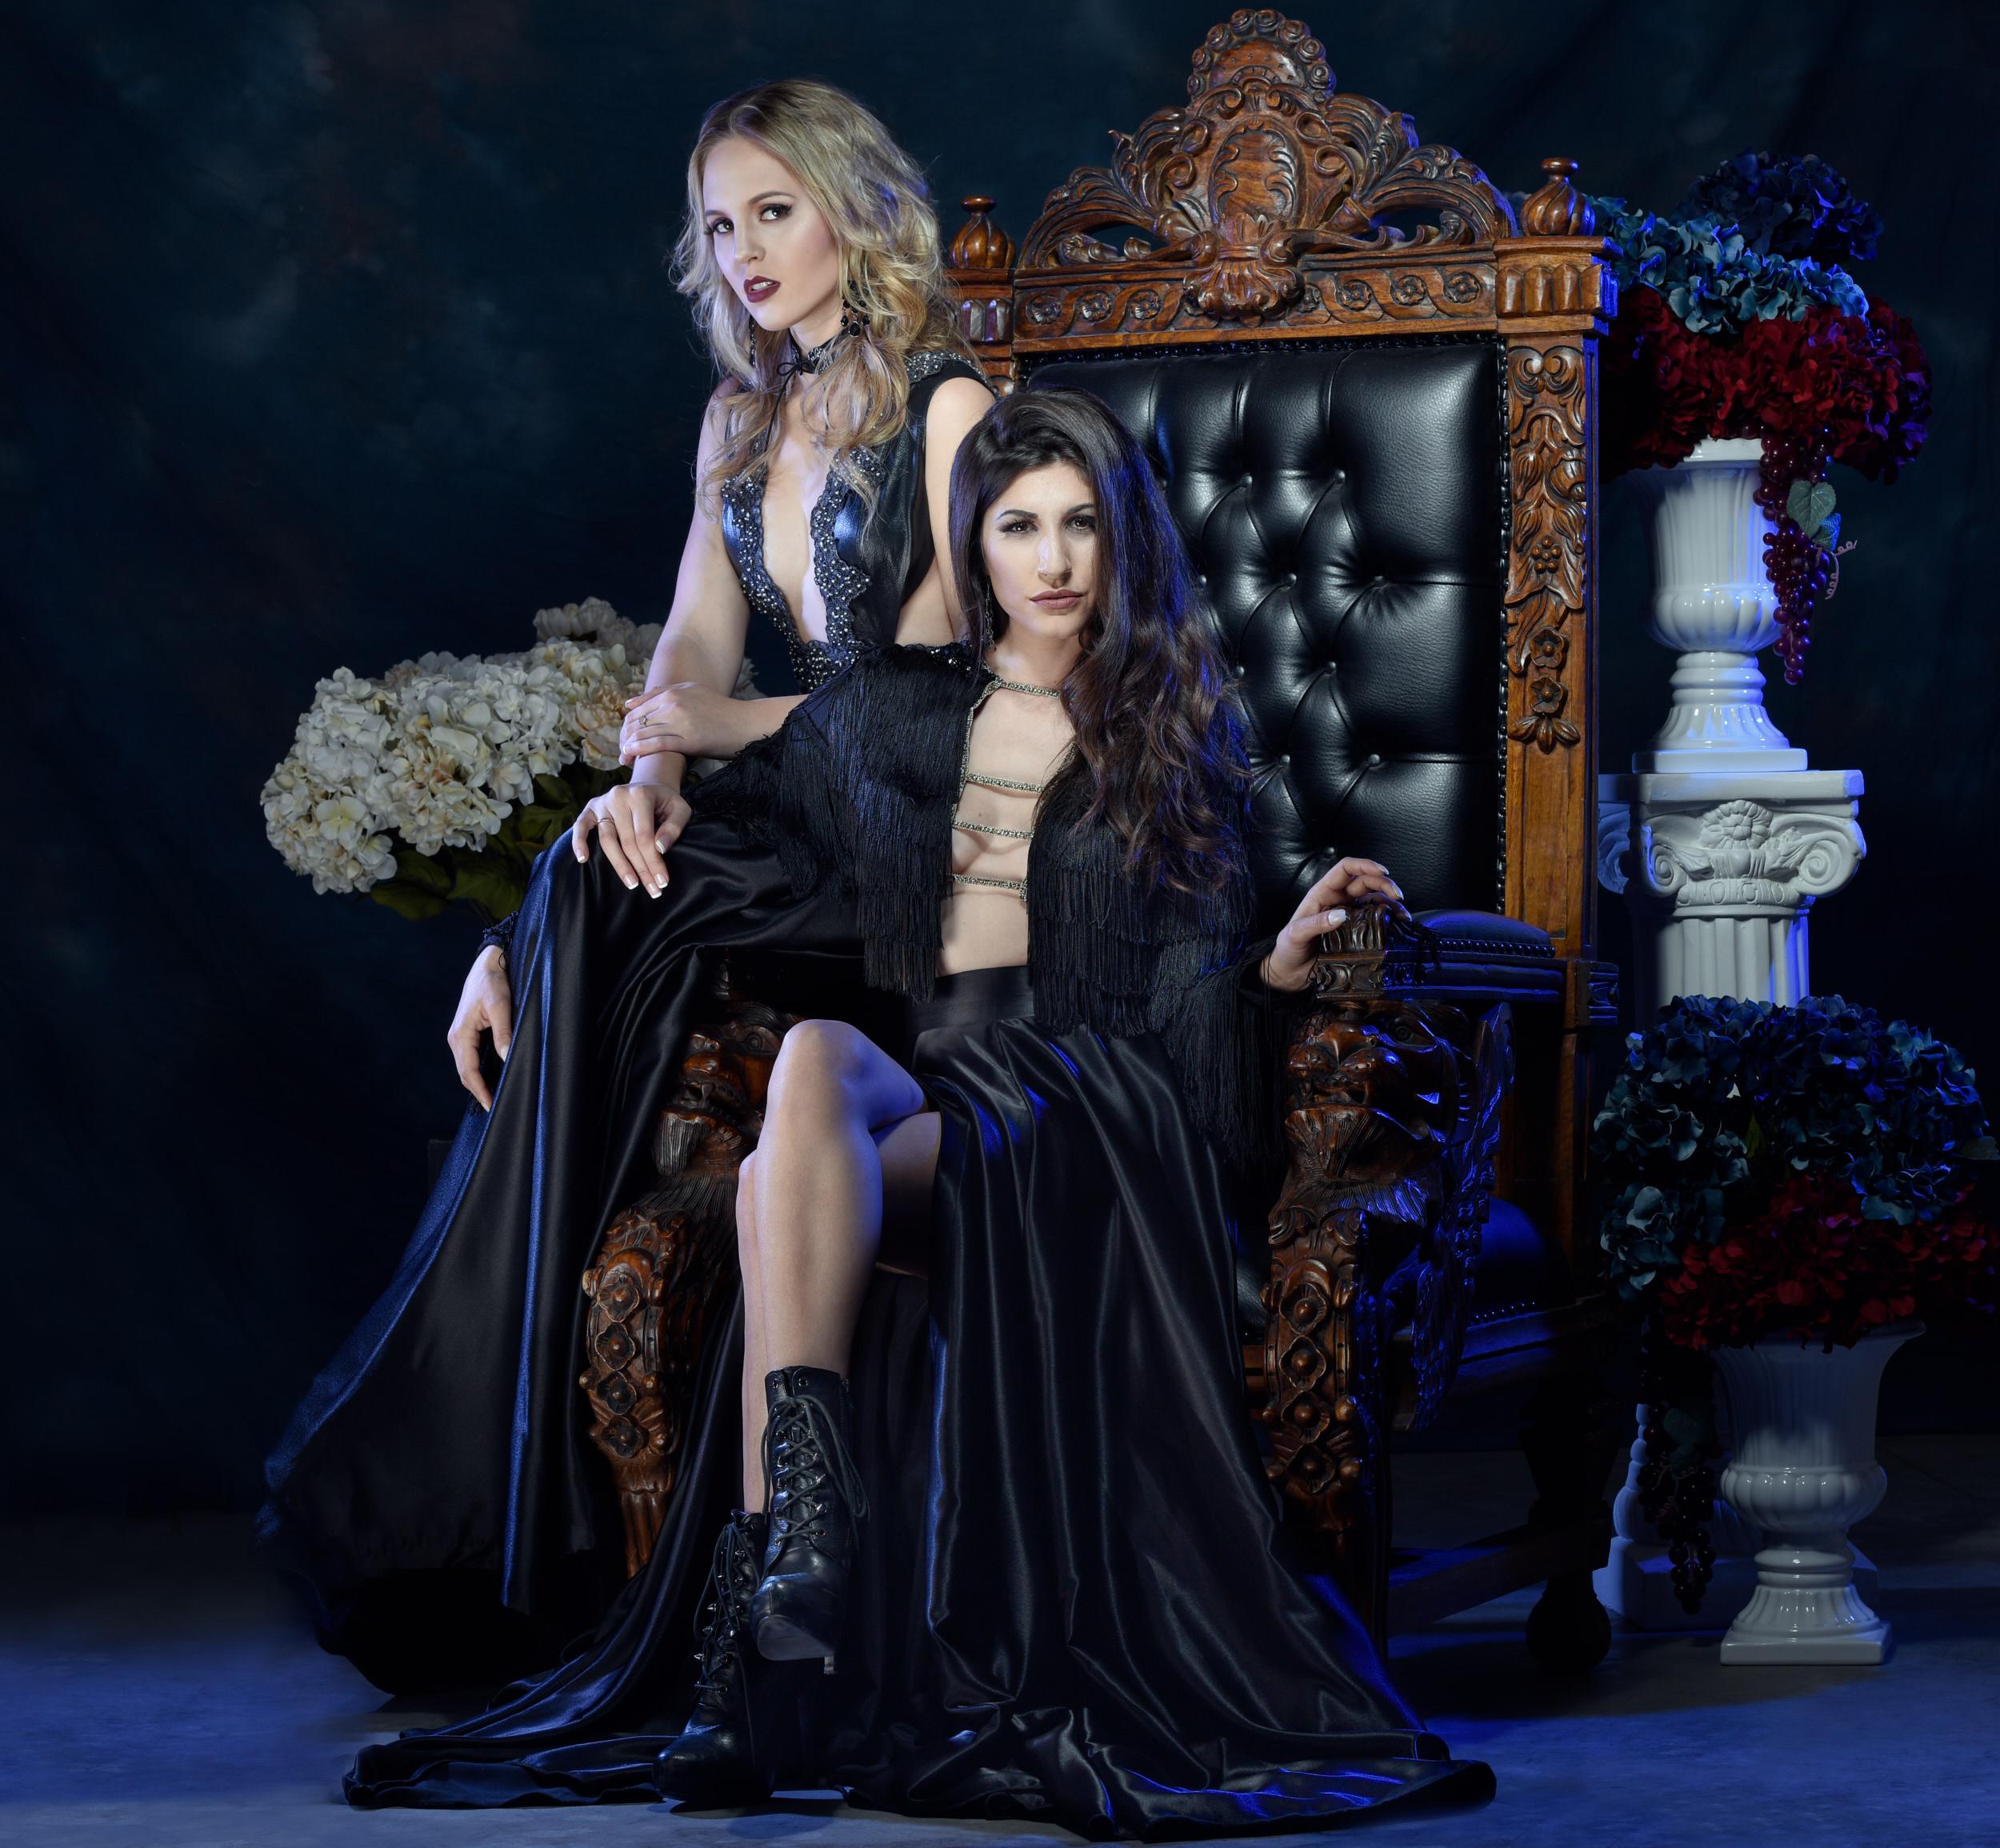 Dark fashion, gothic shot for Tucson clothing designer Esteban by Paul Davis Photography, Tucson, Arizona.